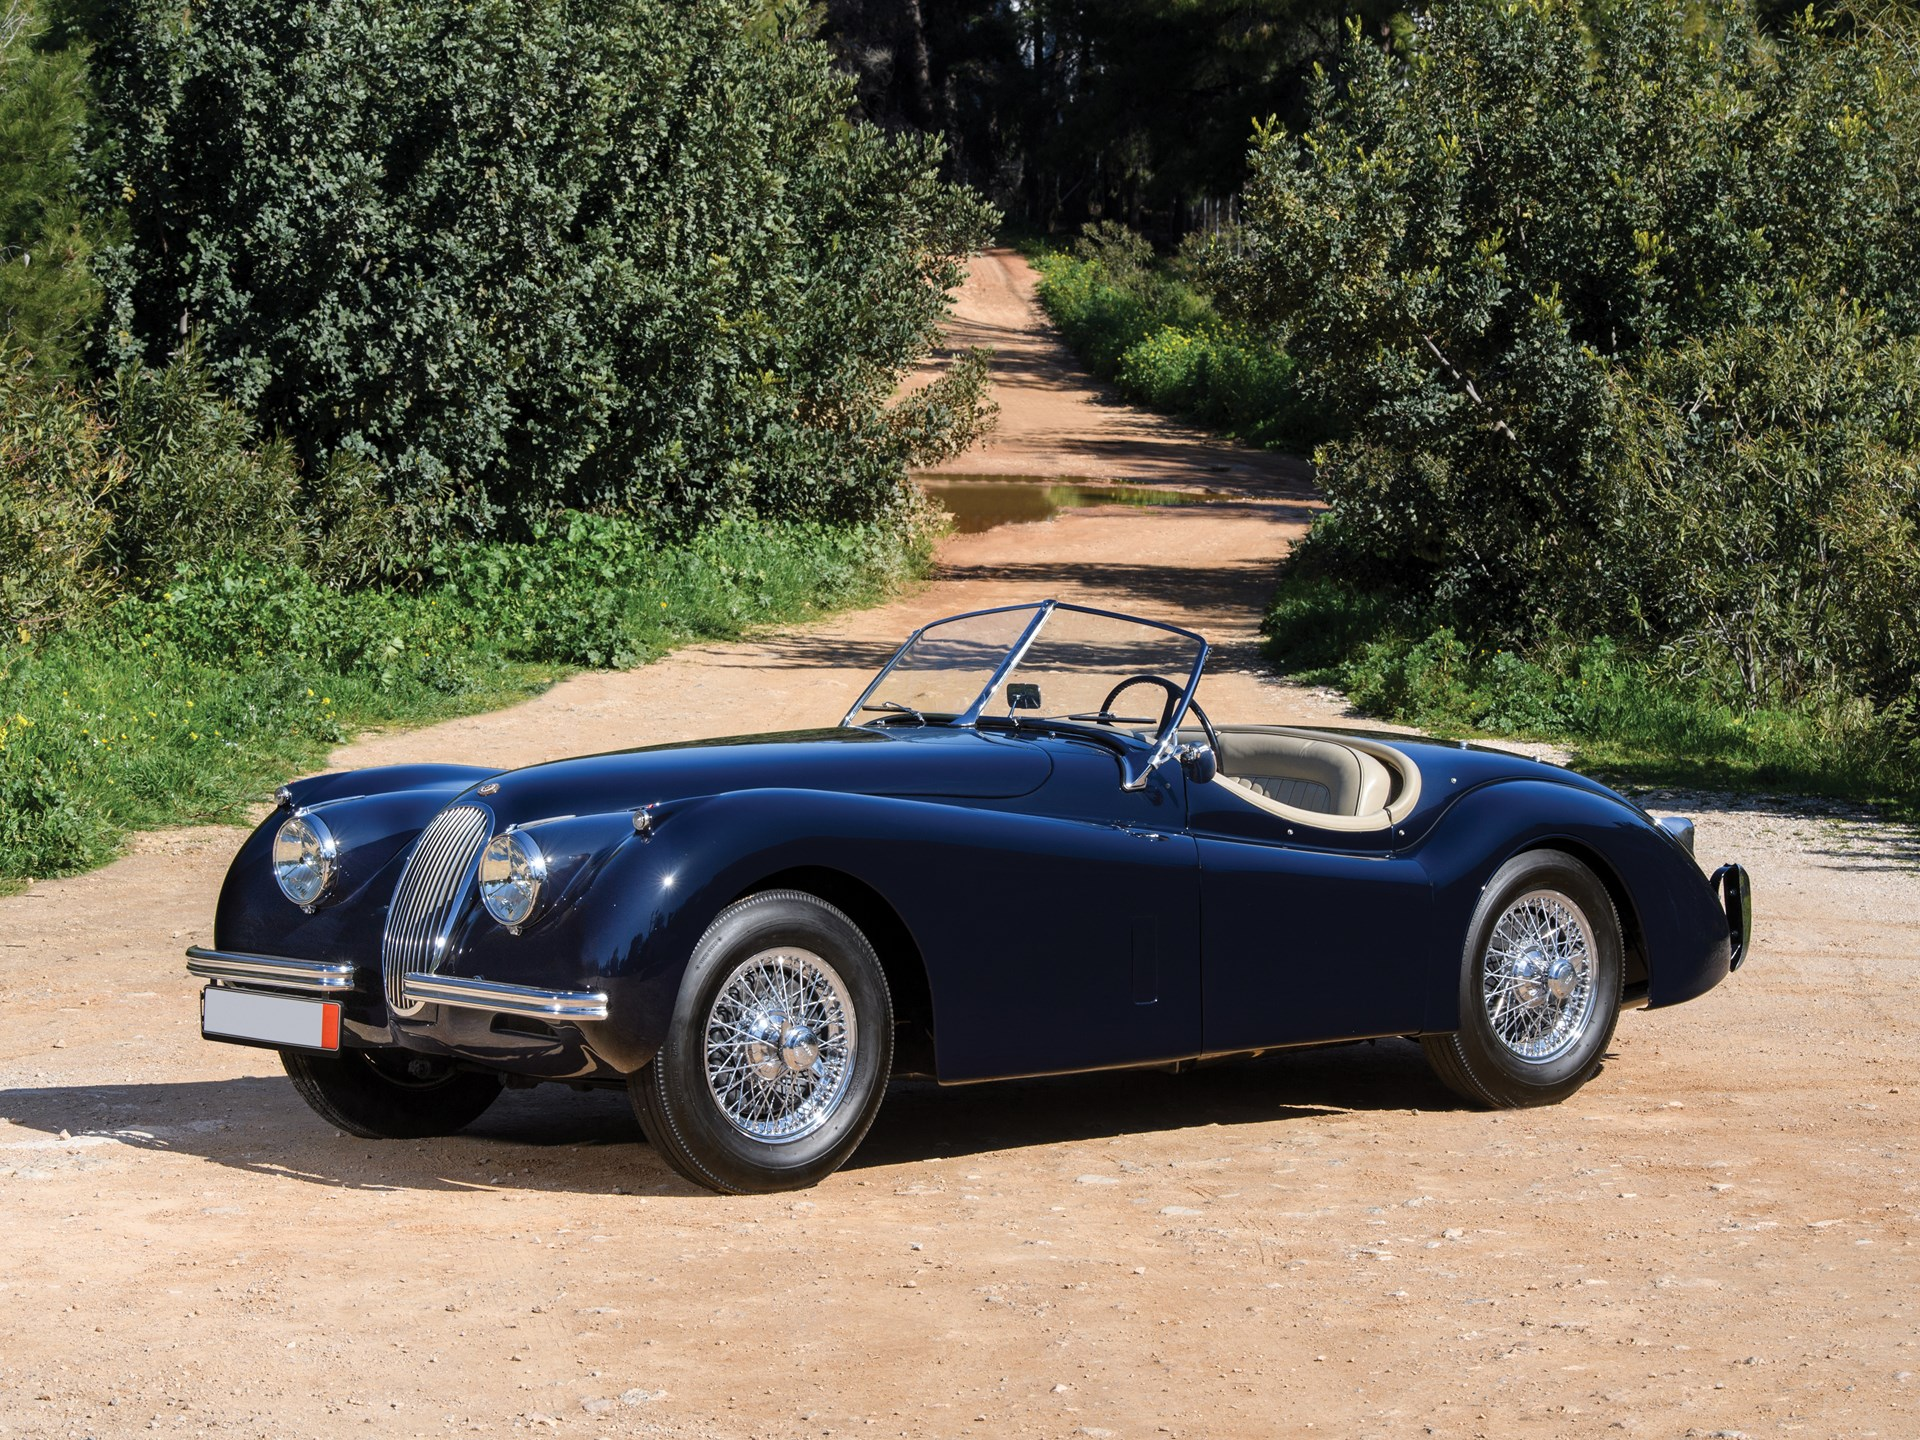 rm sotheby's - 1954 jaguar xk 120 se roadster | essen 2019